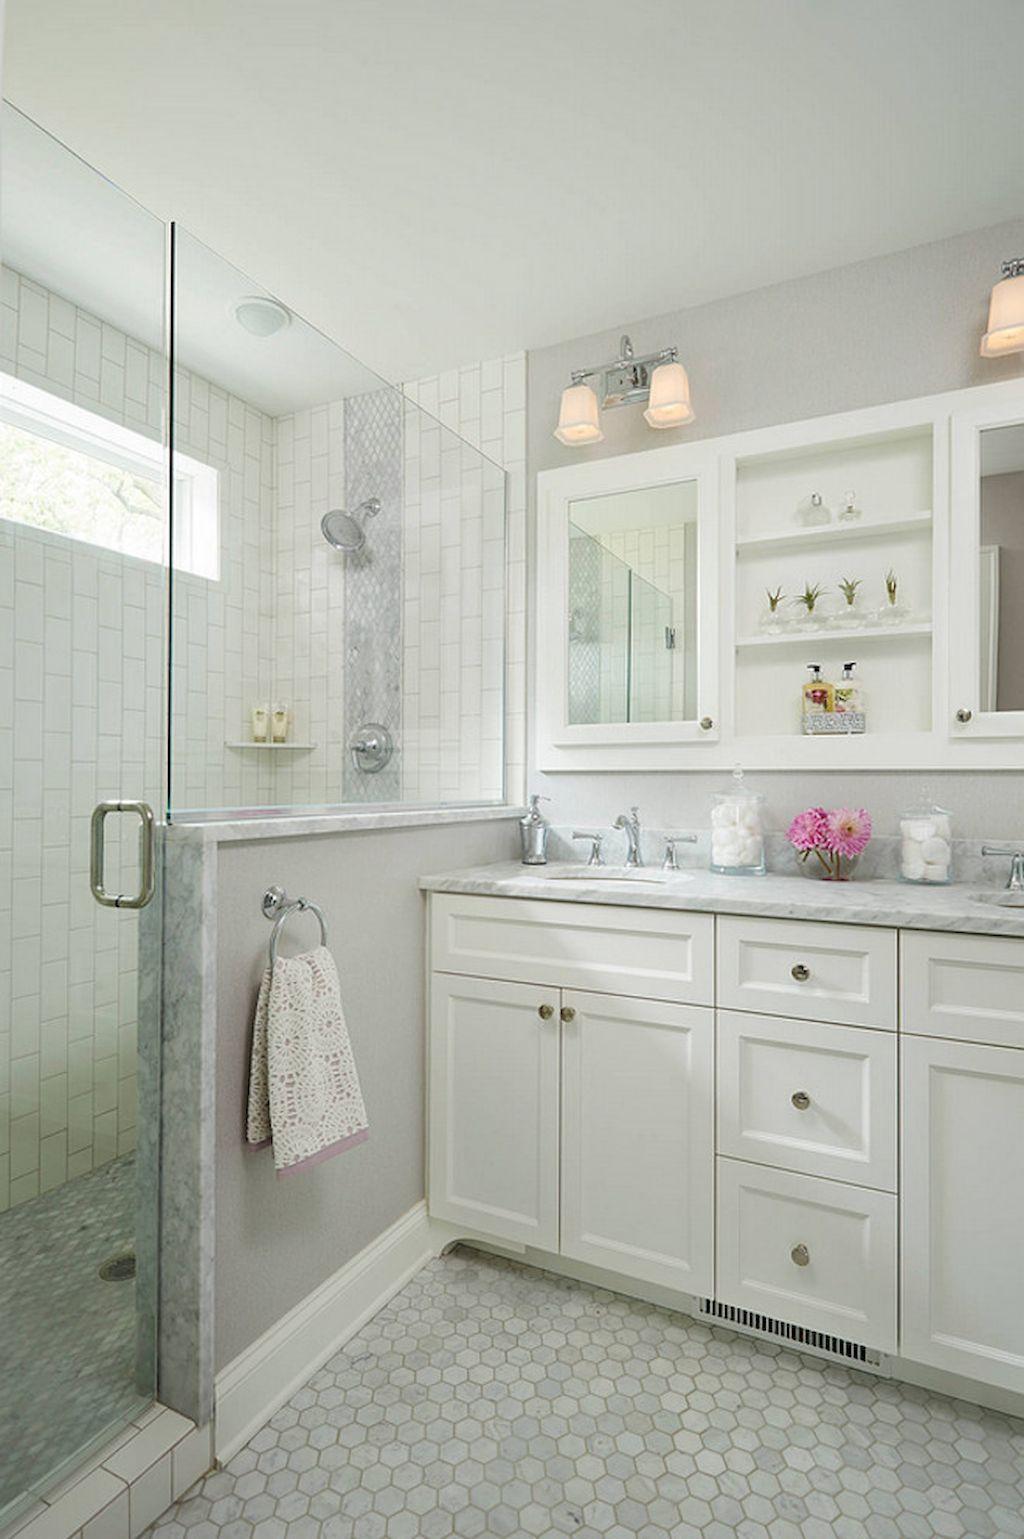 Sensational Design Ideas Small Master Bathroom Designs 16 Restroom Ideas  Middot Flooring Grya Bathroom Flooring Light Gray The Floor Tile Is